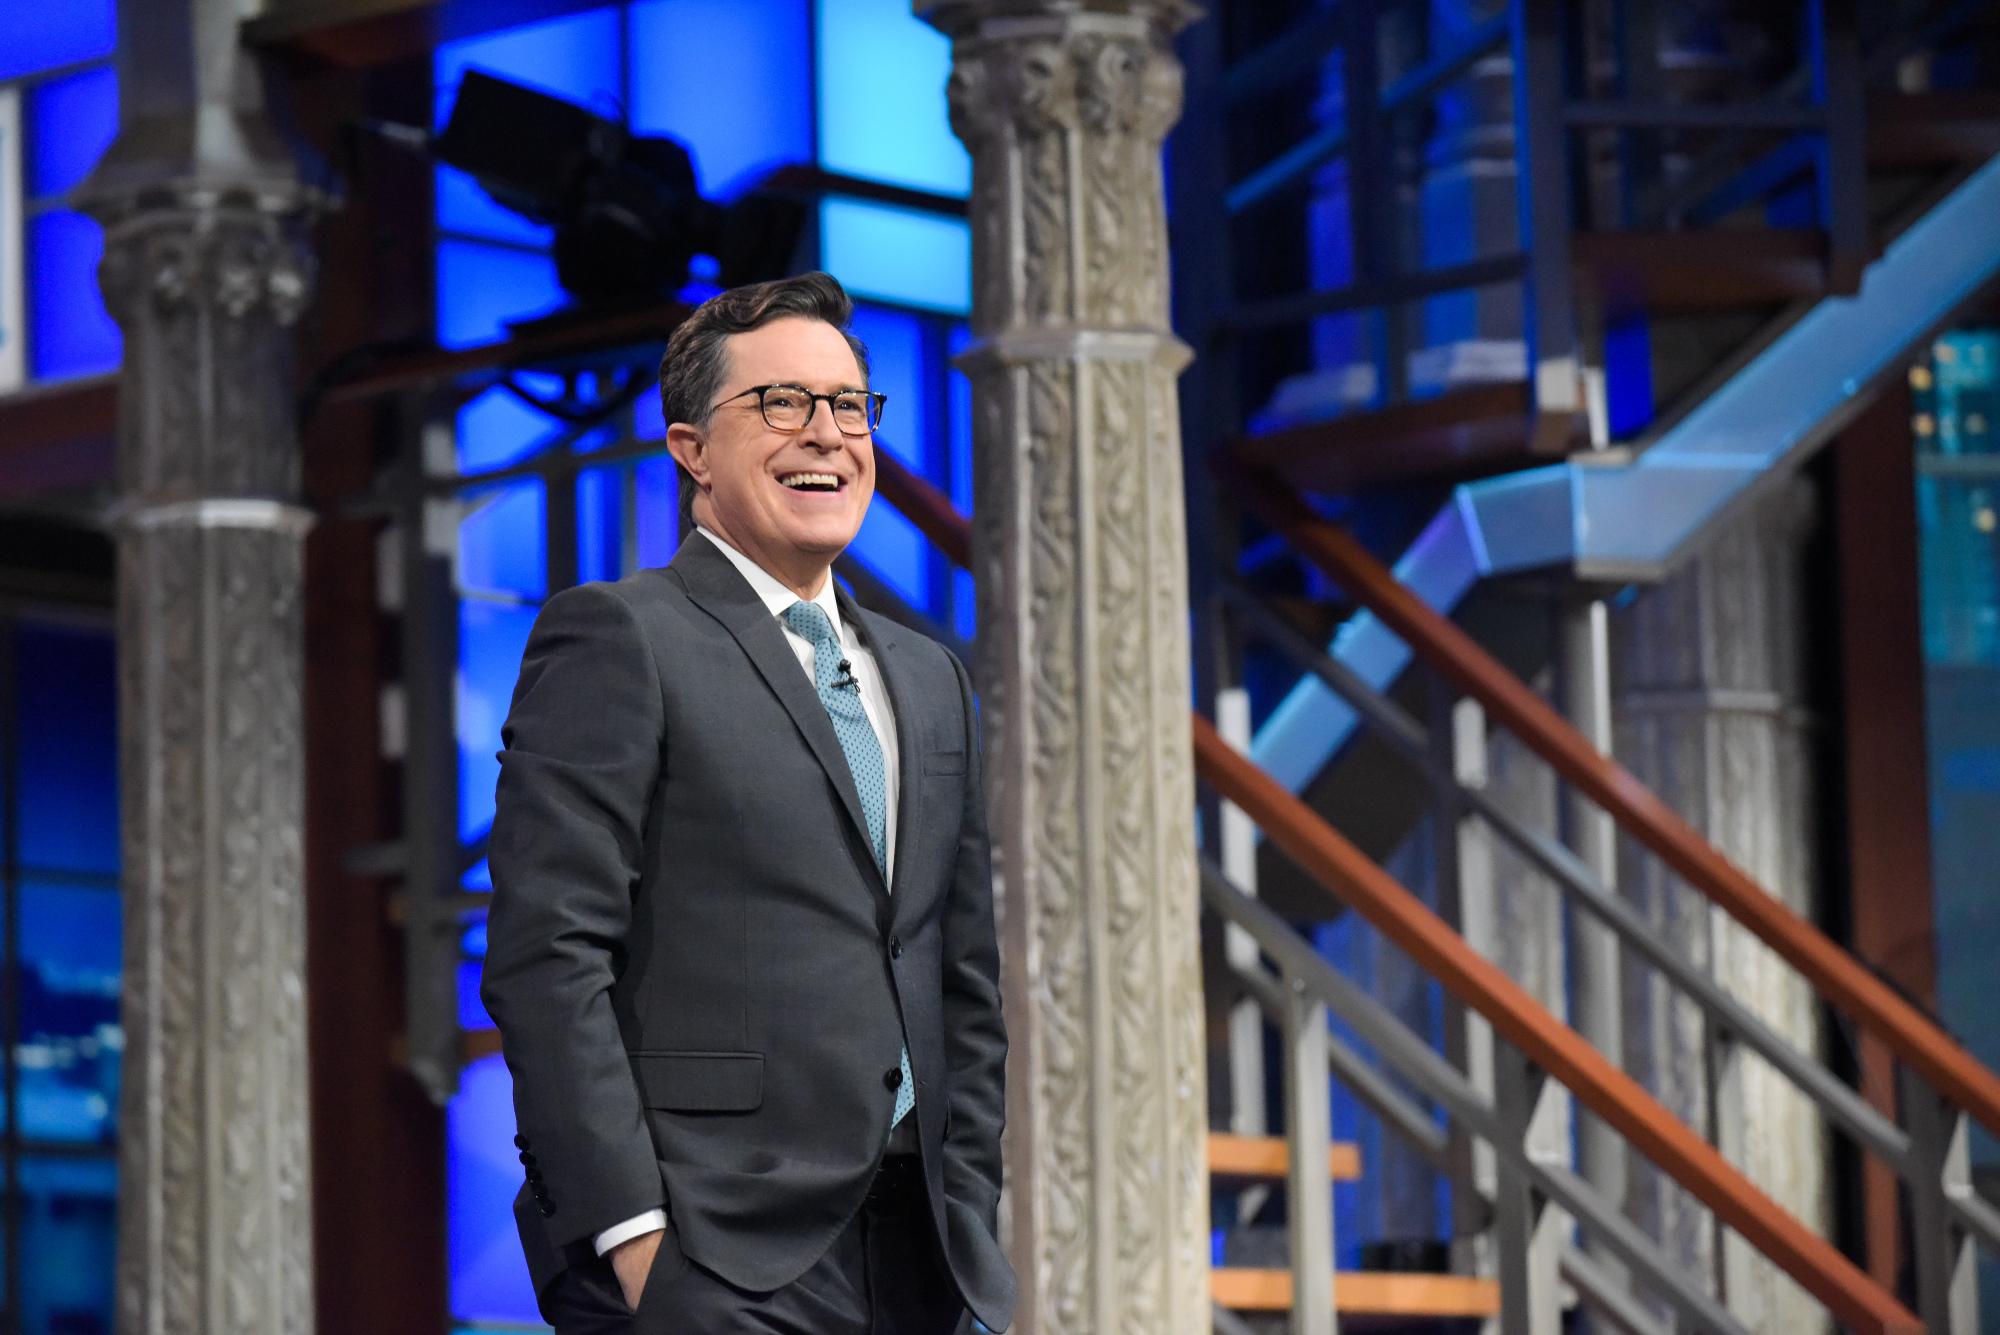 The News According to Stephen Colbert